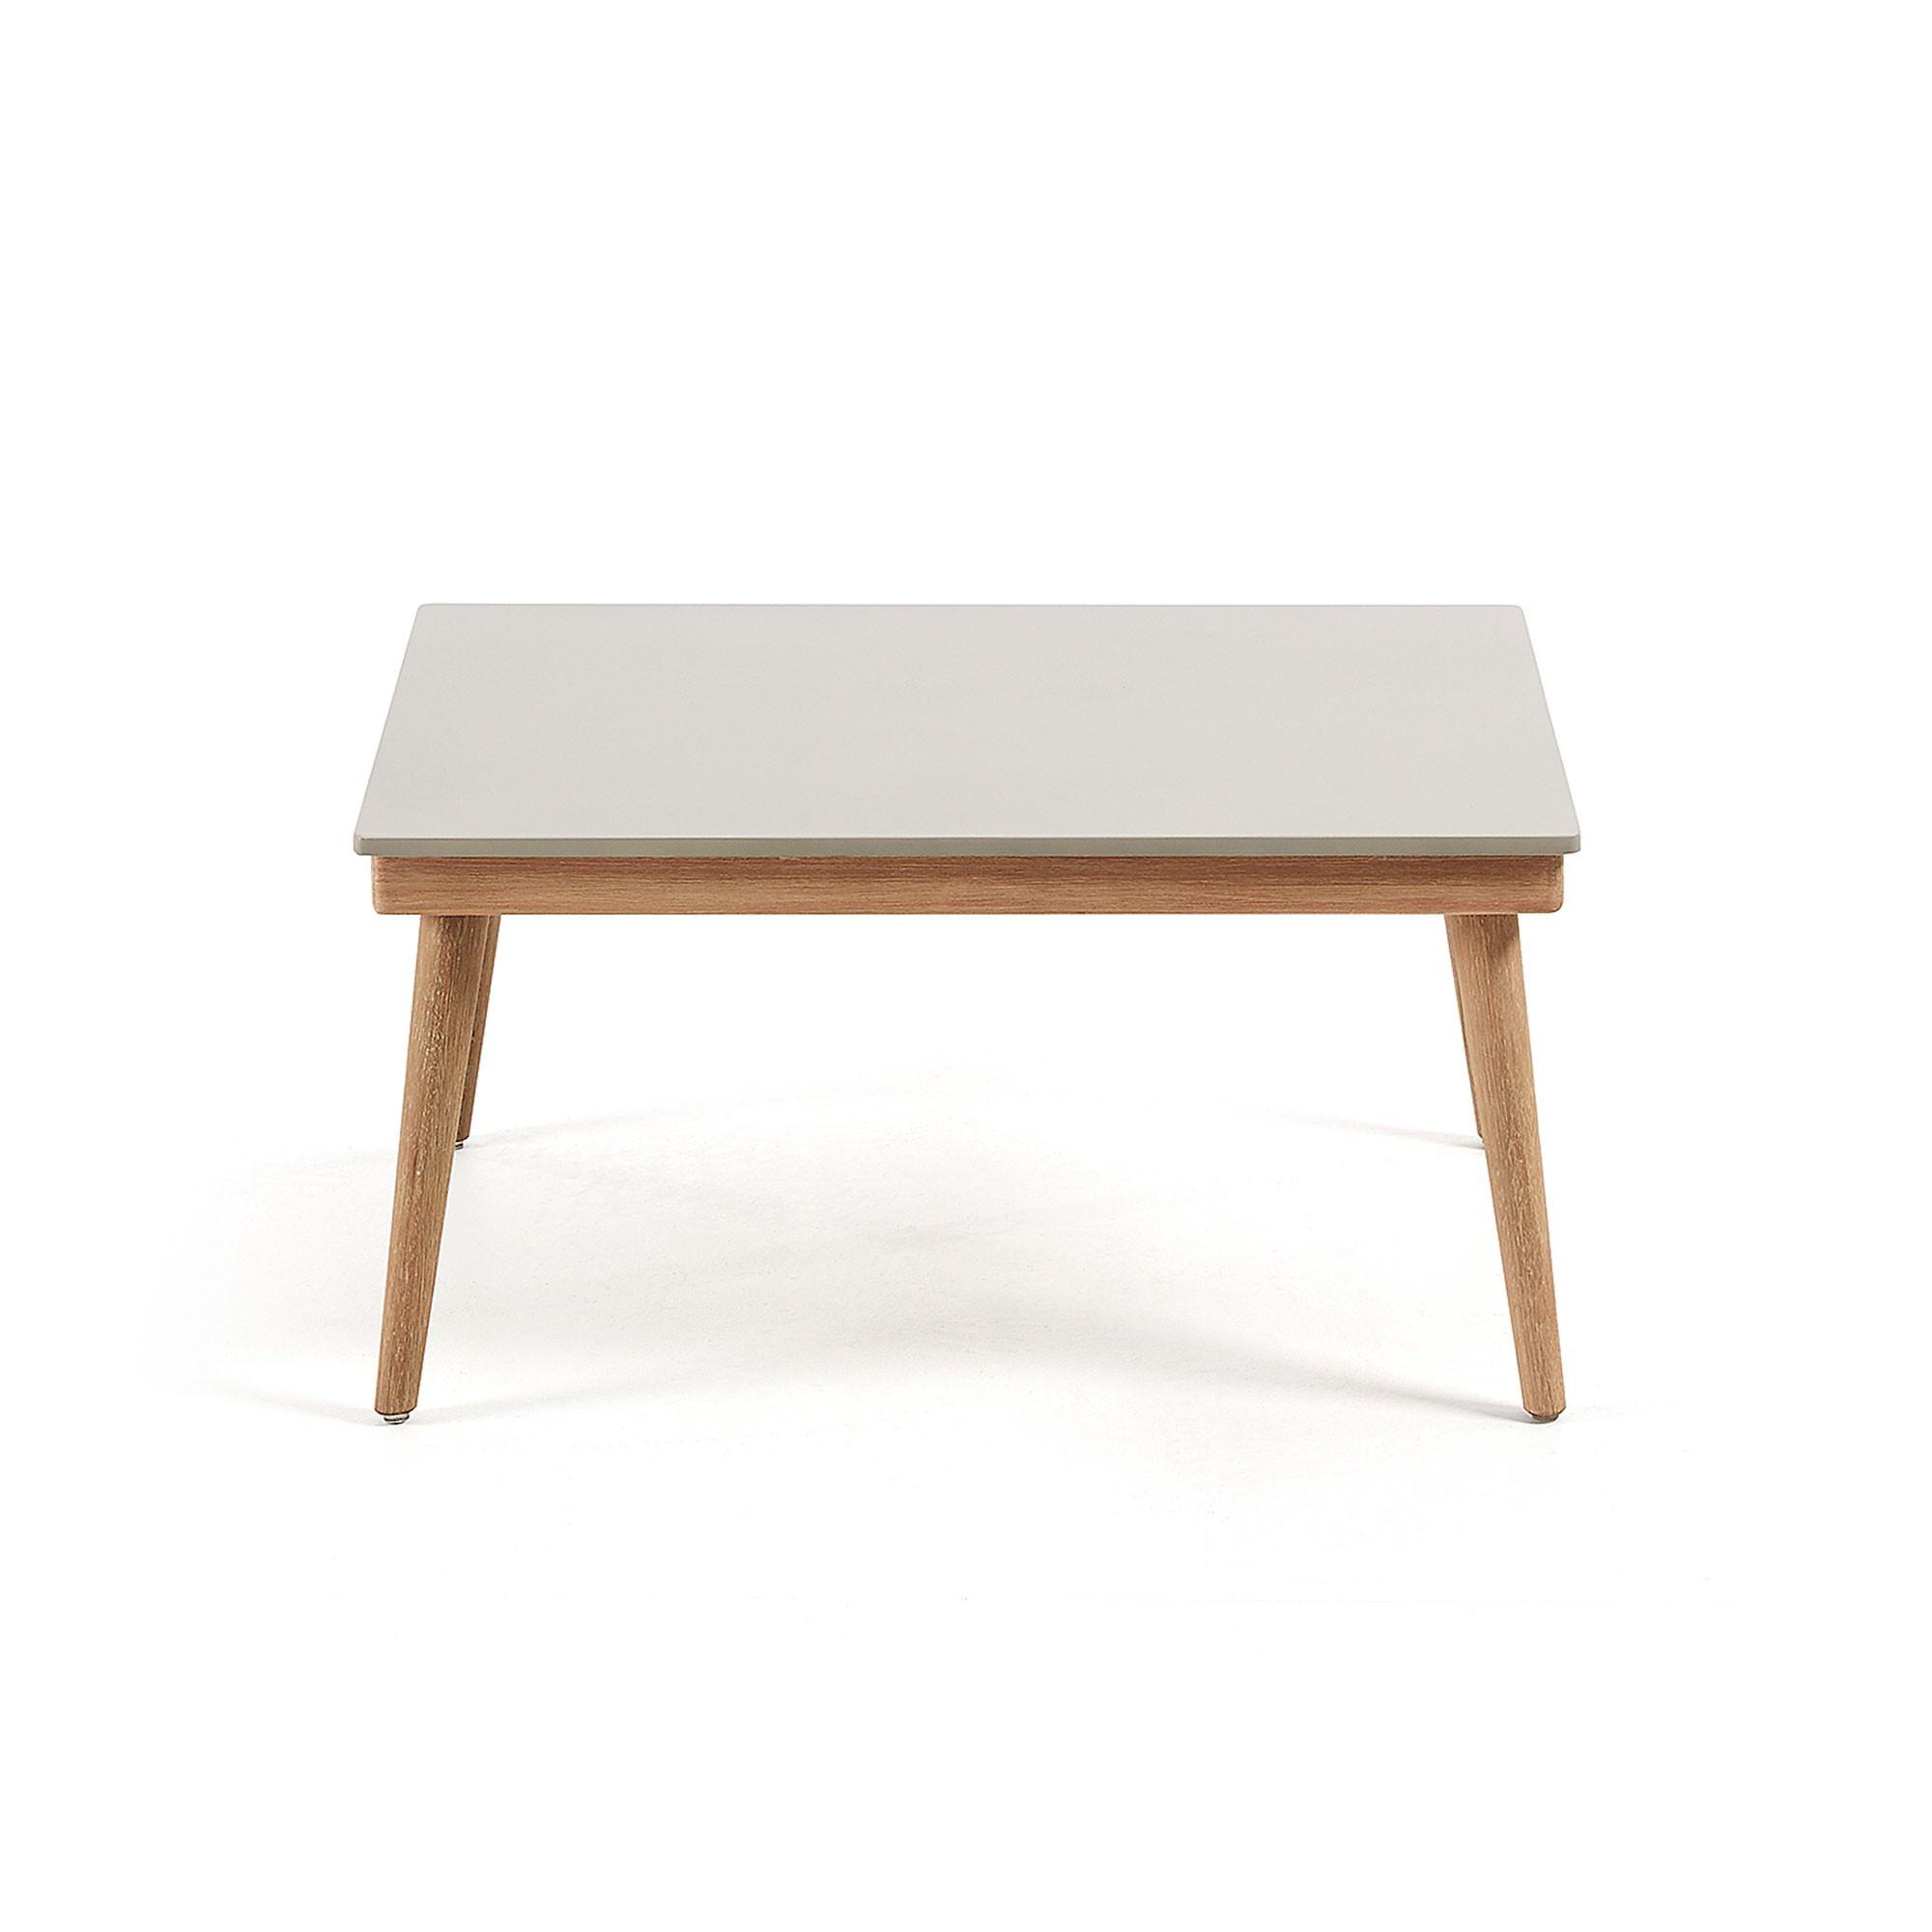 Horwood Eucalyptus Timber Indoor / Outdoor Coffee Table, 80cm